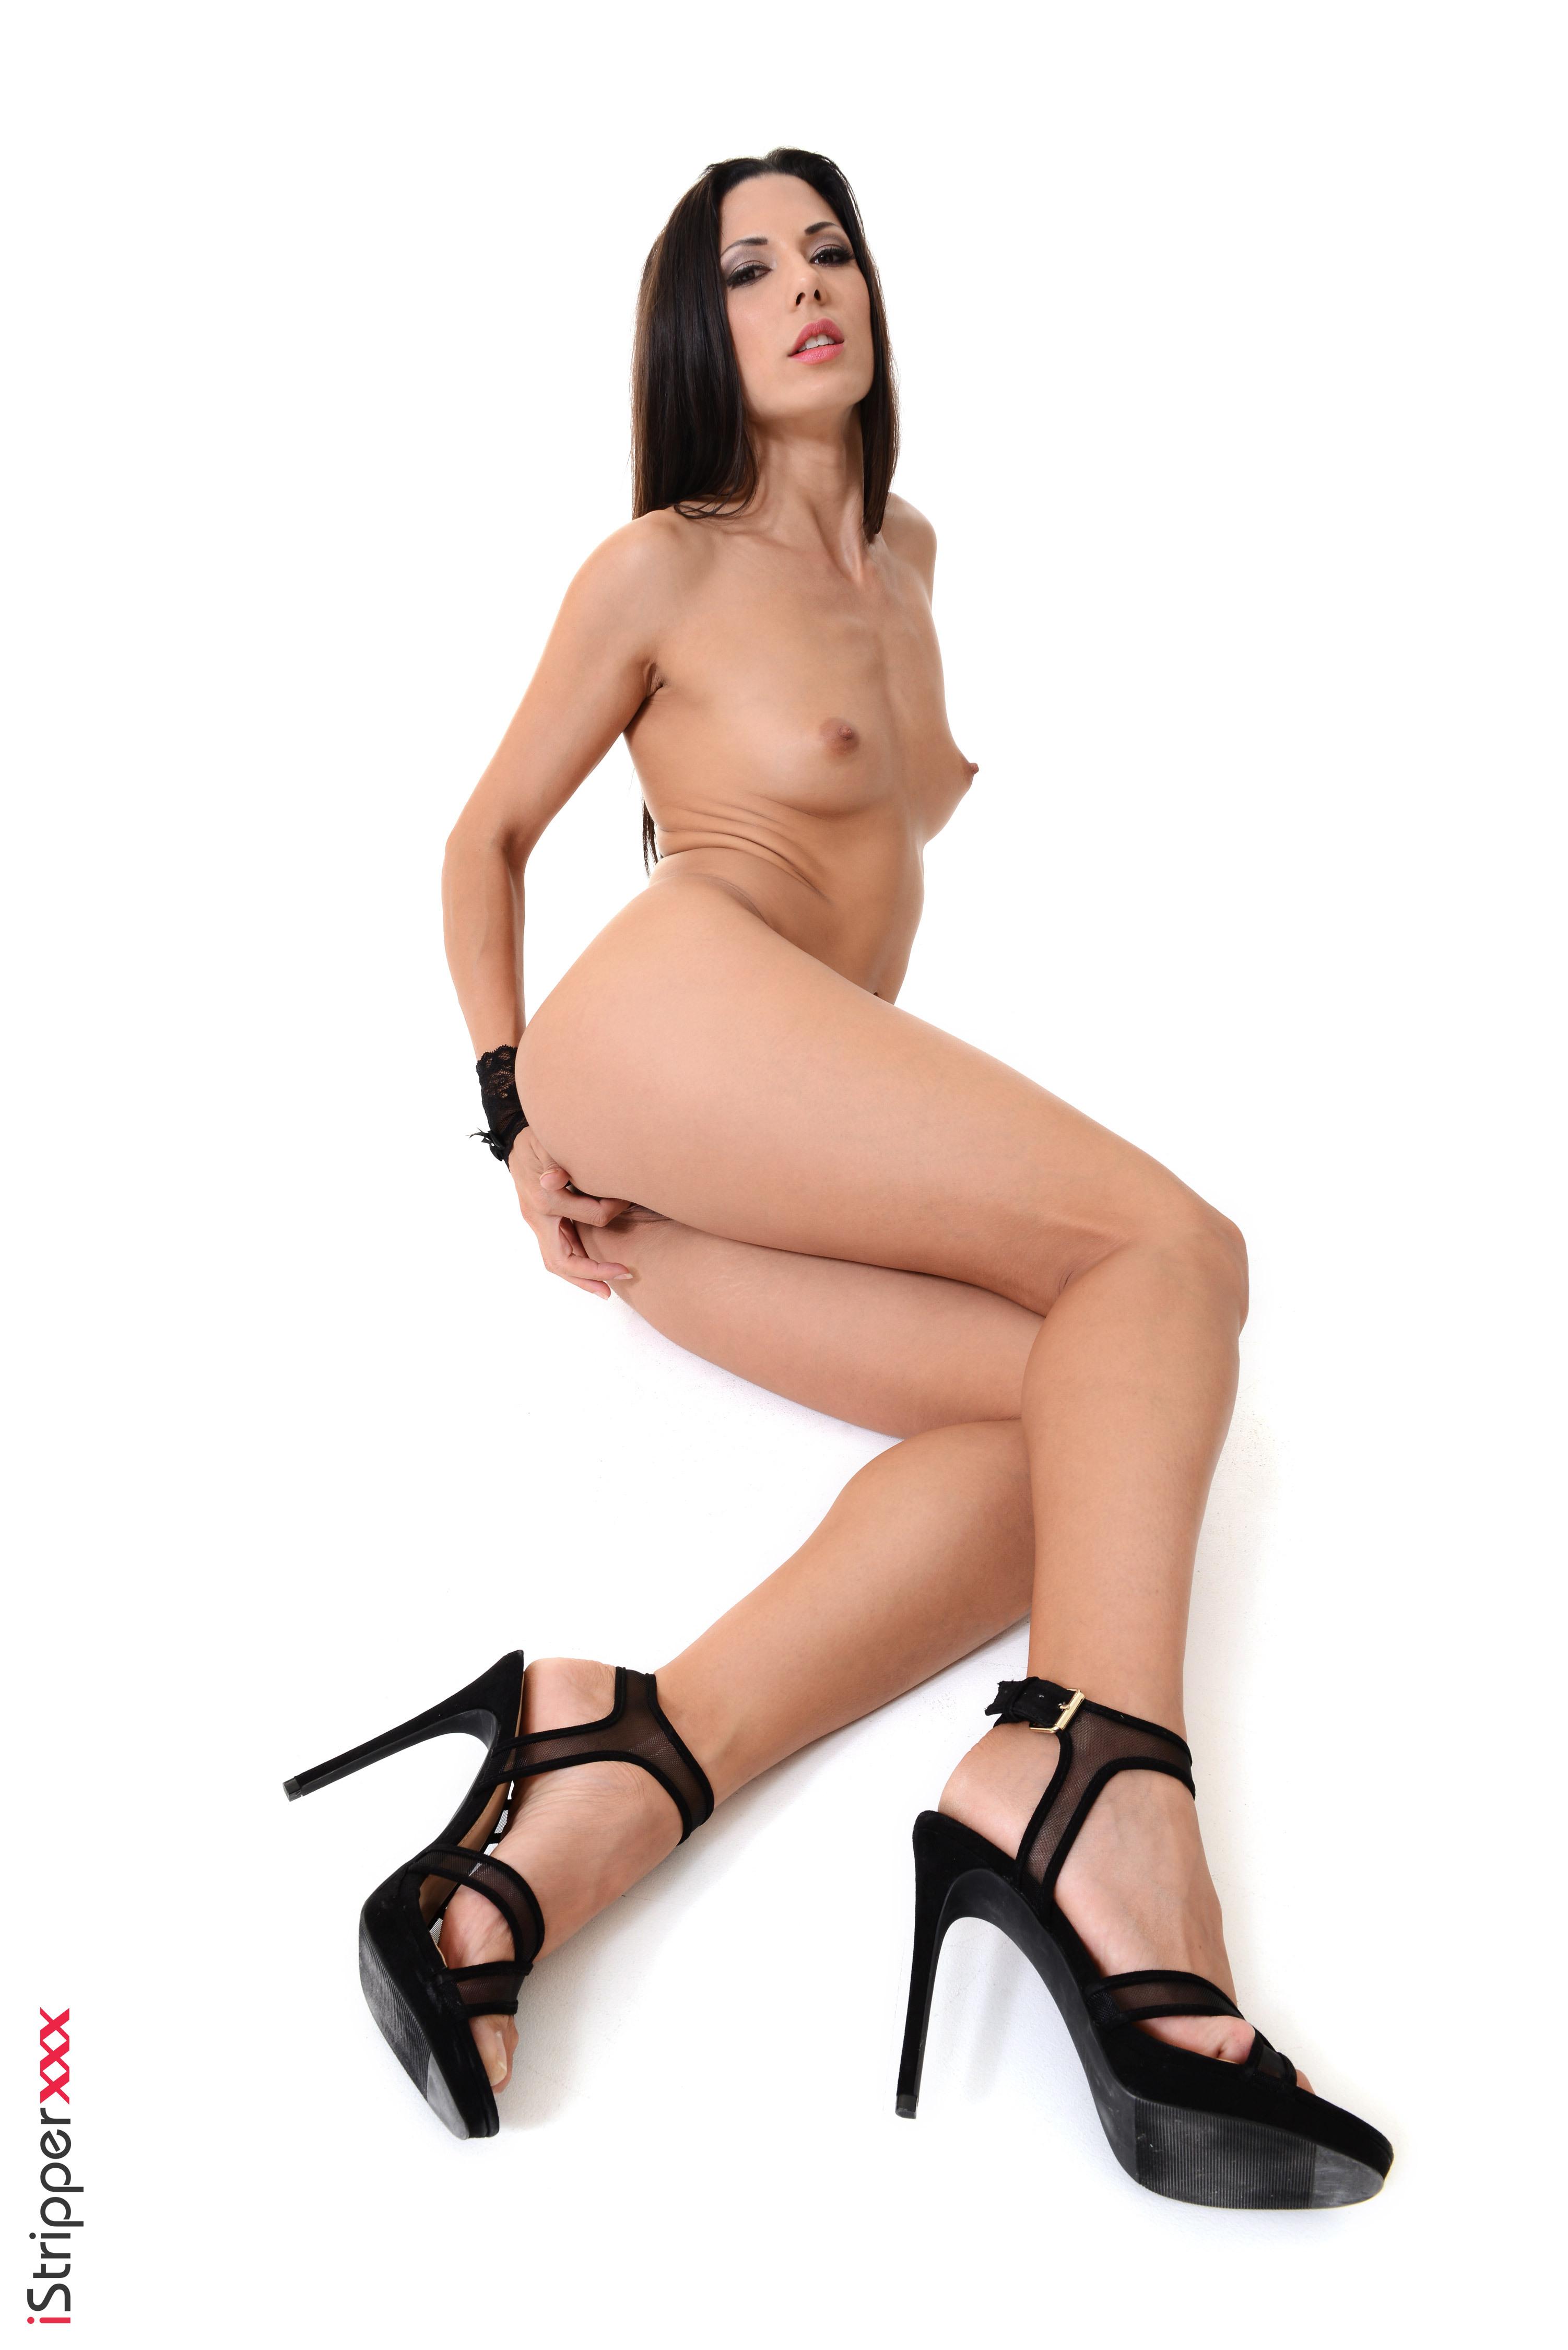 nude sexy girl wallpaper